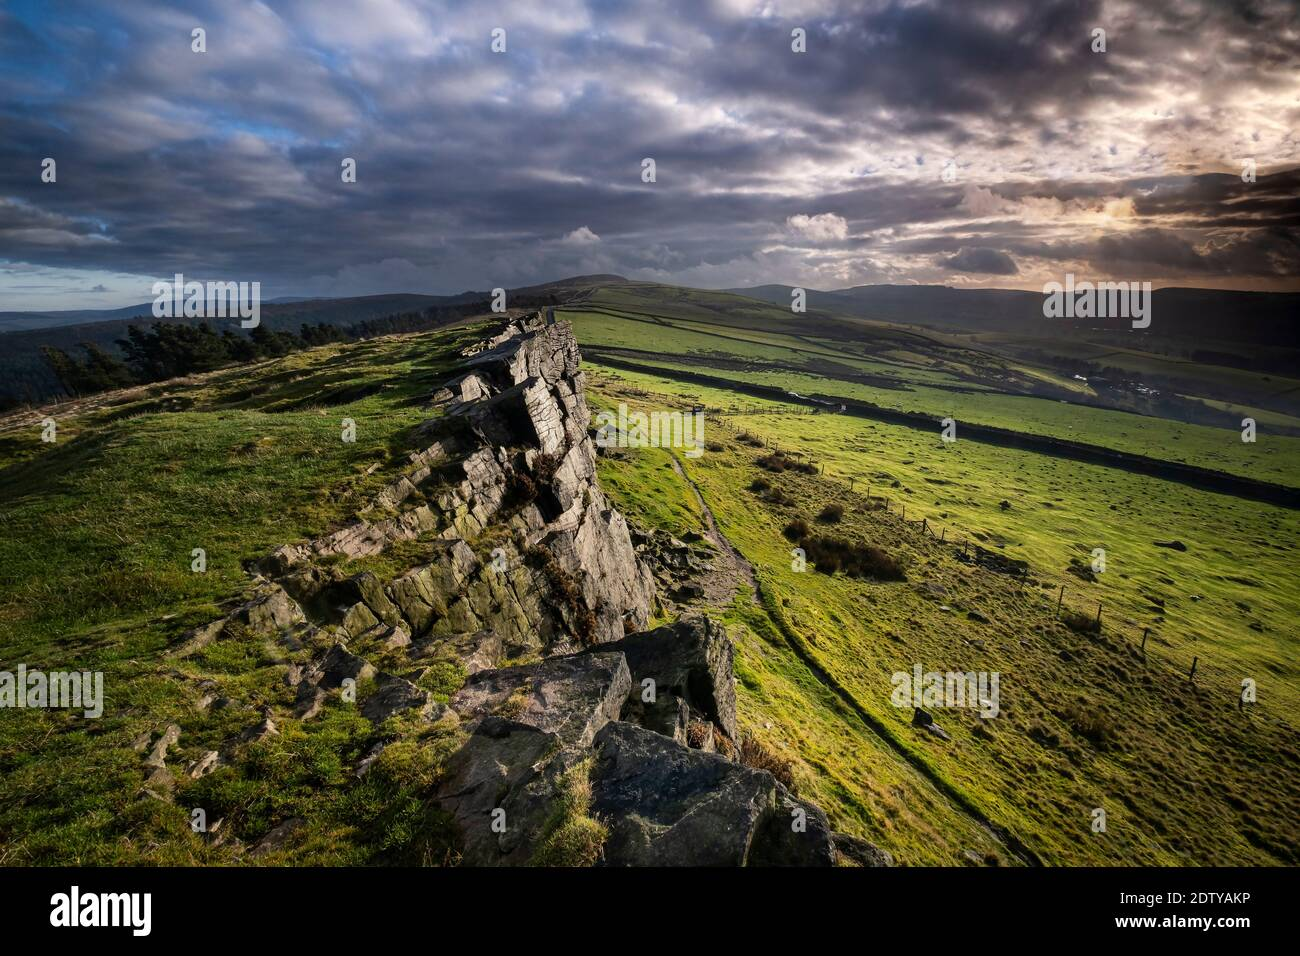 Windgather Rocks, Cheshire and Derbyshire Border, Peak District National Park, England, UK Stock Photo